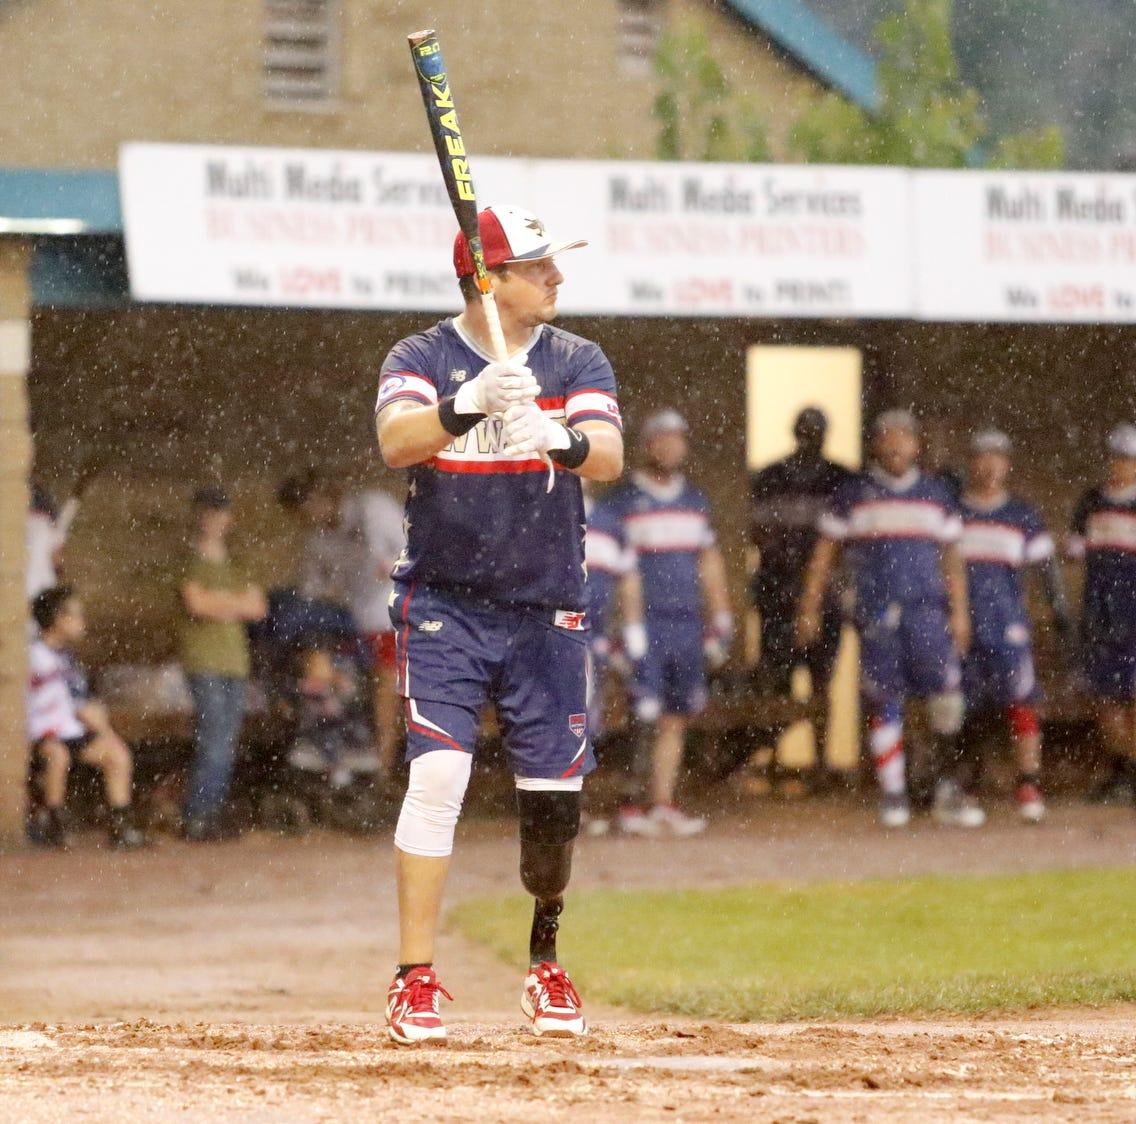 Gallery: Elmira Pioneers host Wounded Warrior Amputee Softball Team